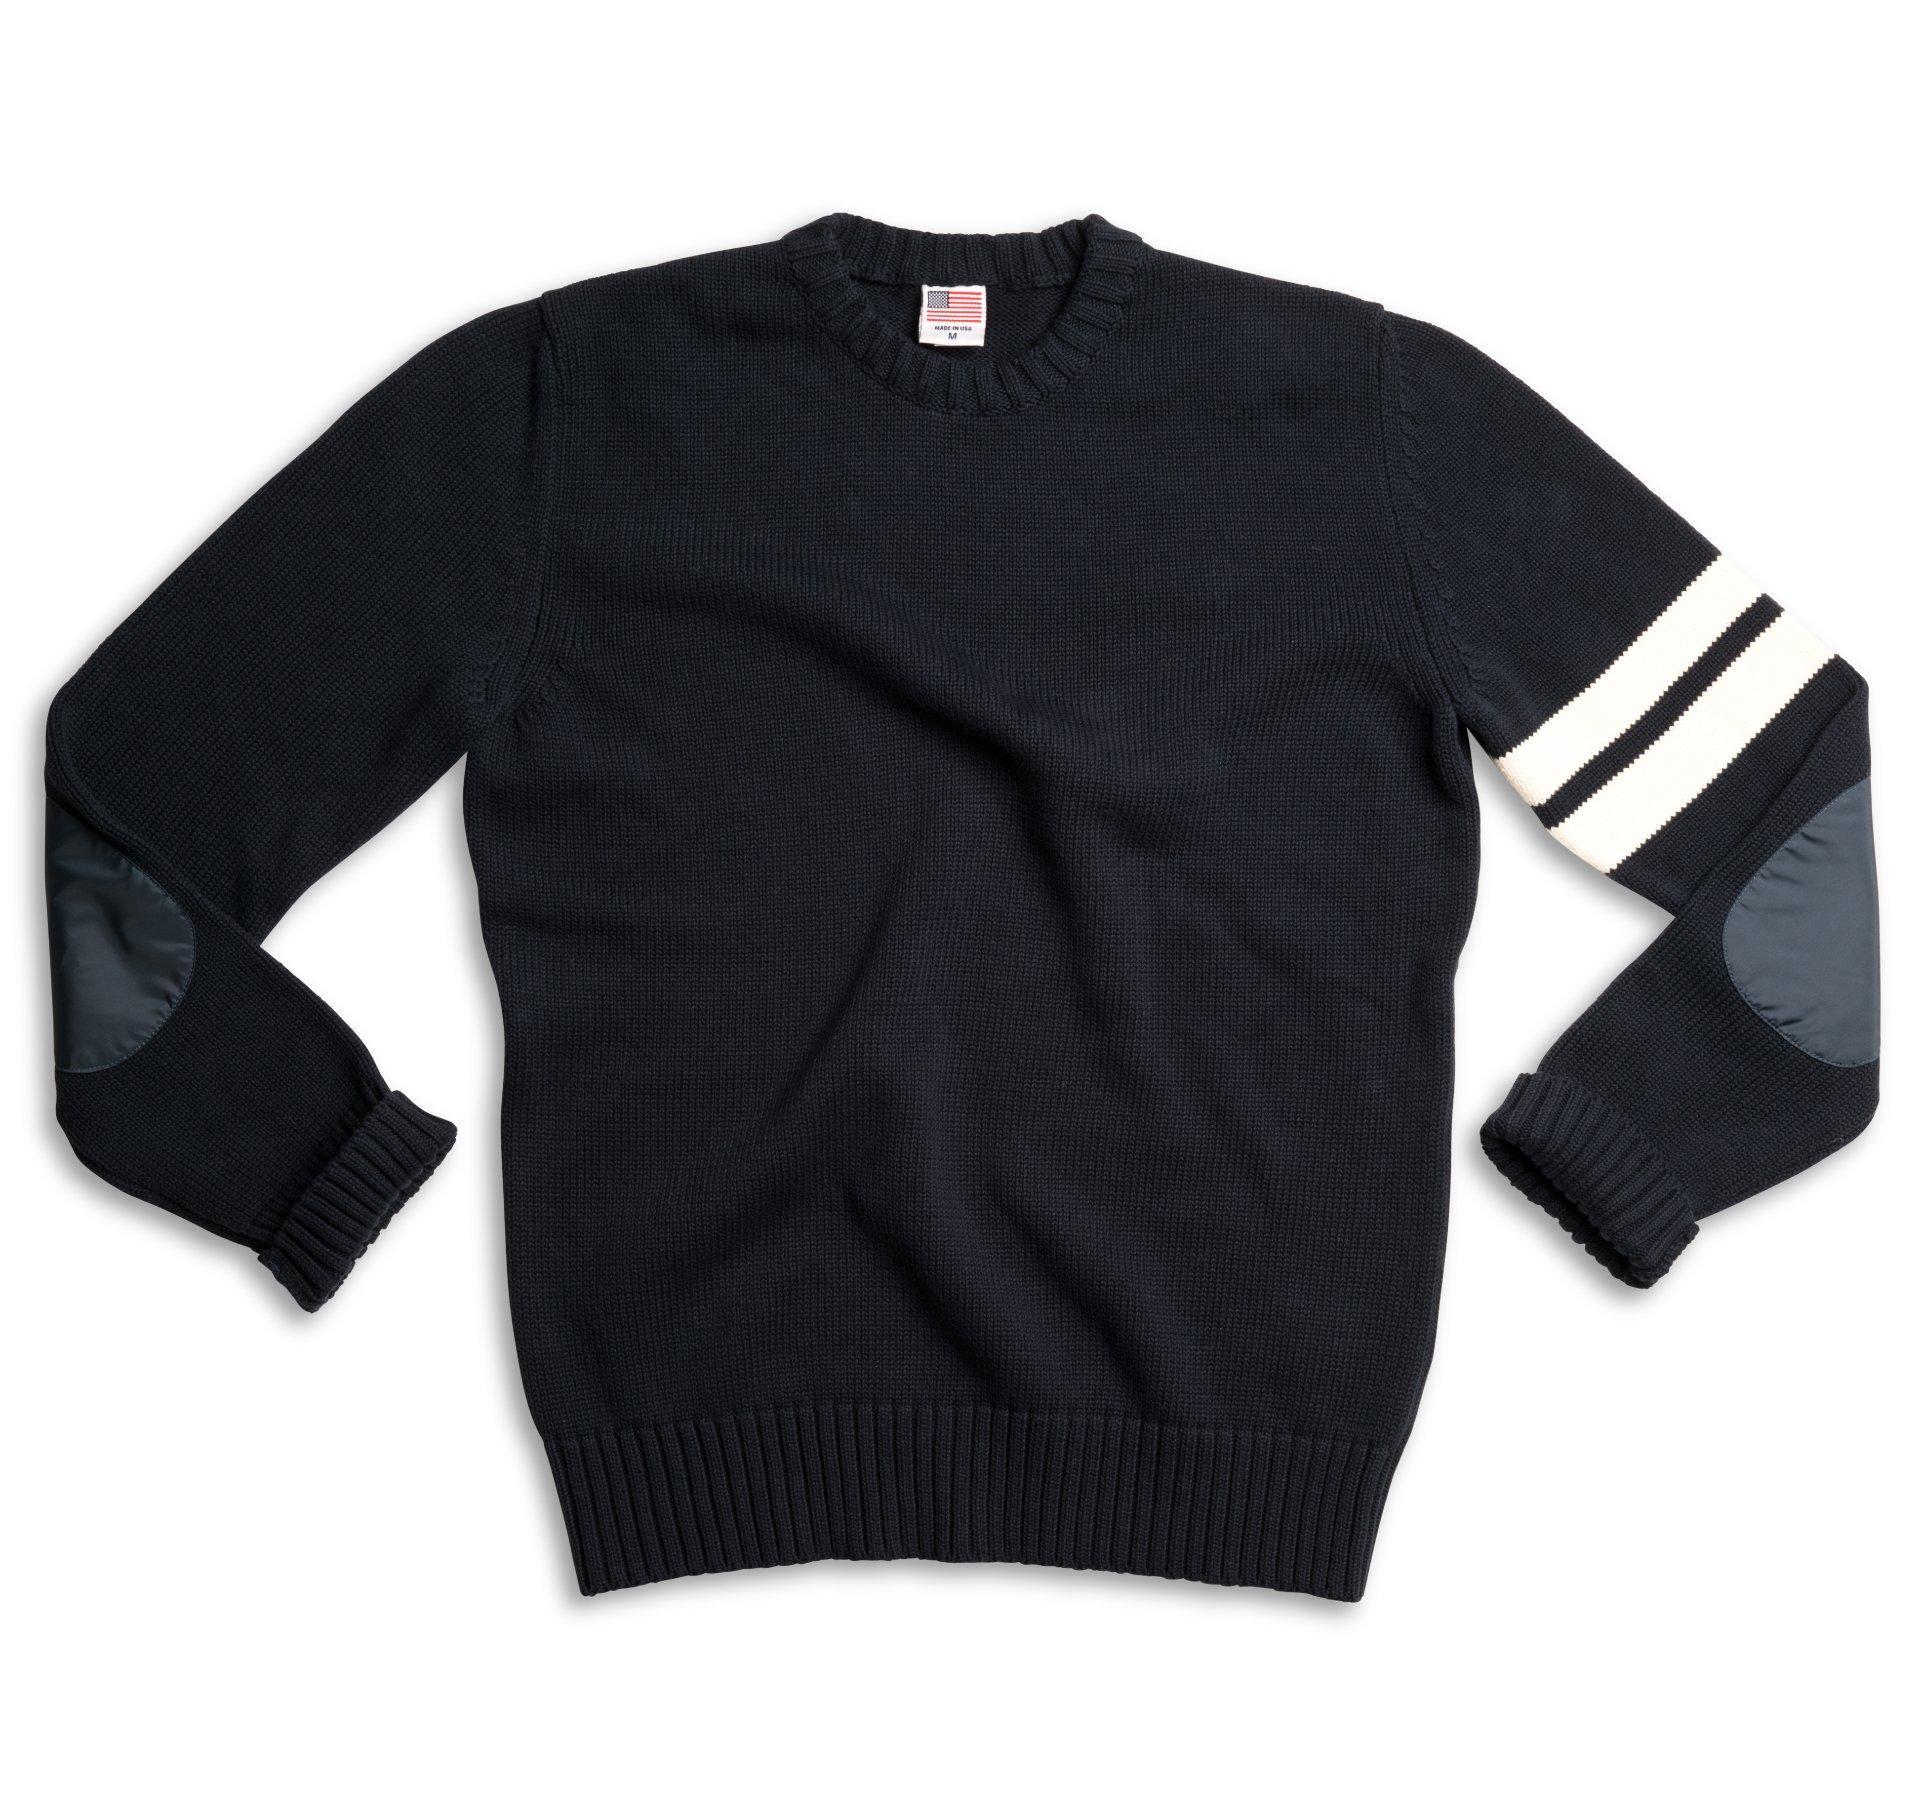 Birdwell Men's Crew Neck Knit Sweater (XX-Large)